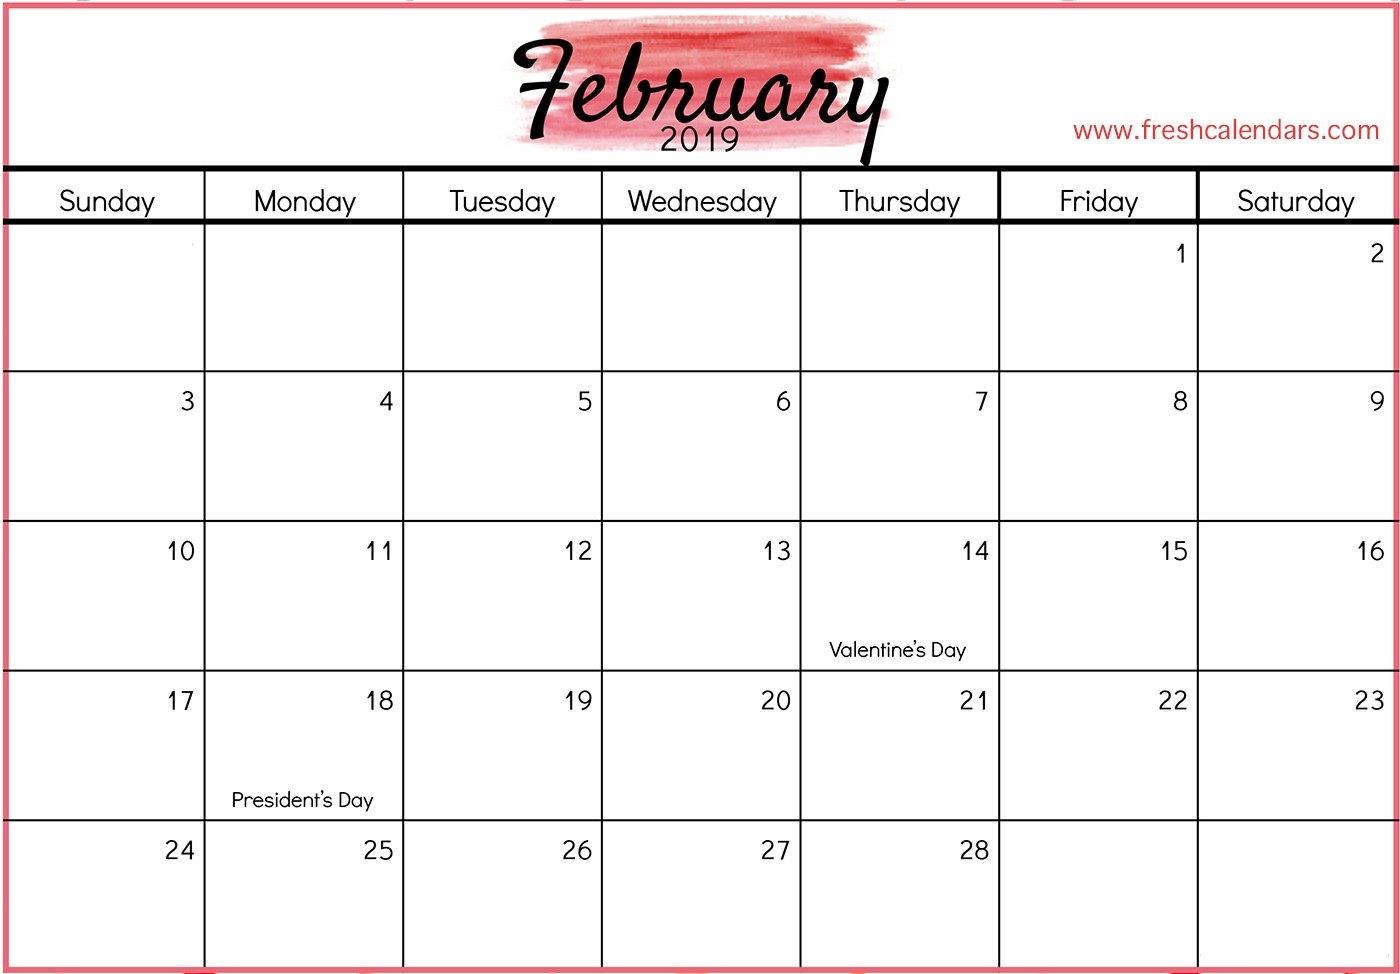 February 2019 Printable Calendars – Fresh Calendars Calendar Feb 9 2019